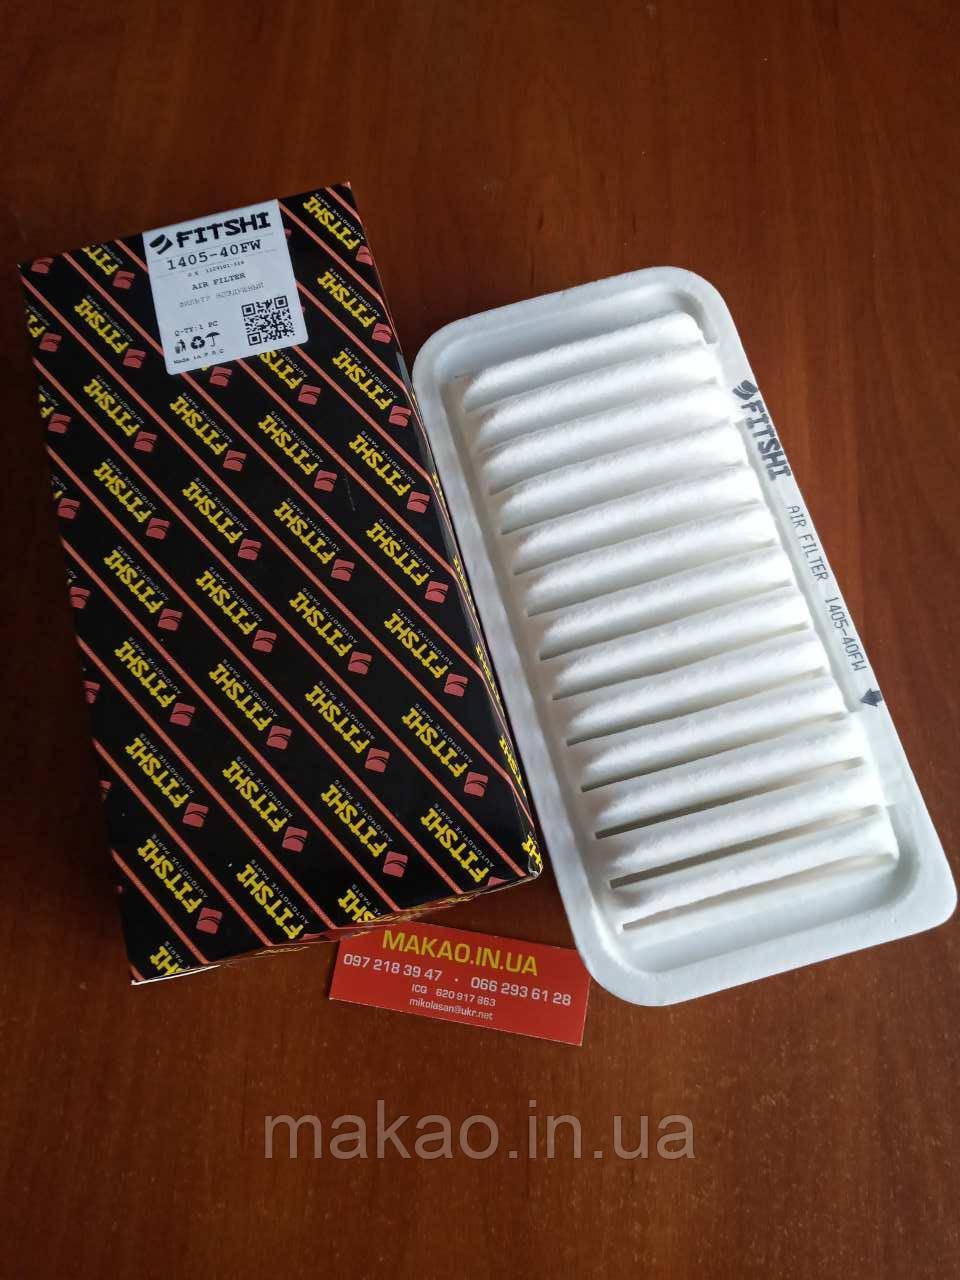 """Fitshi"" Фільтр повітряний Great Wall Voleex C10, C30, M2, M4"